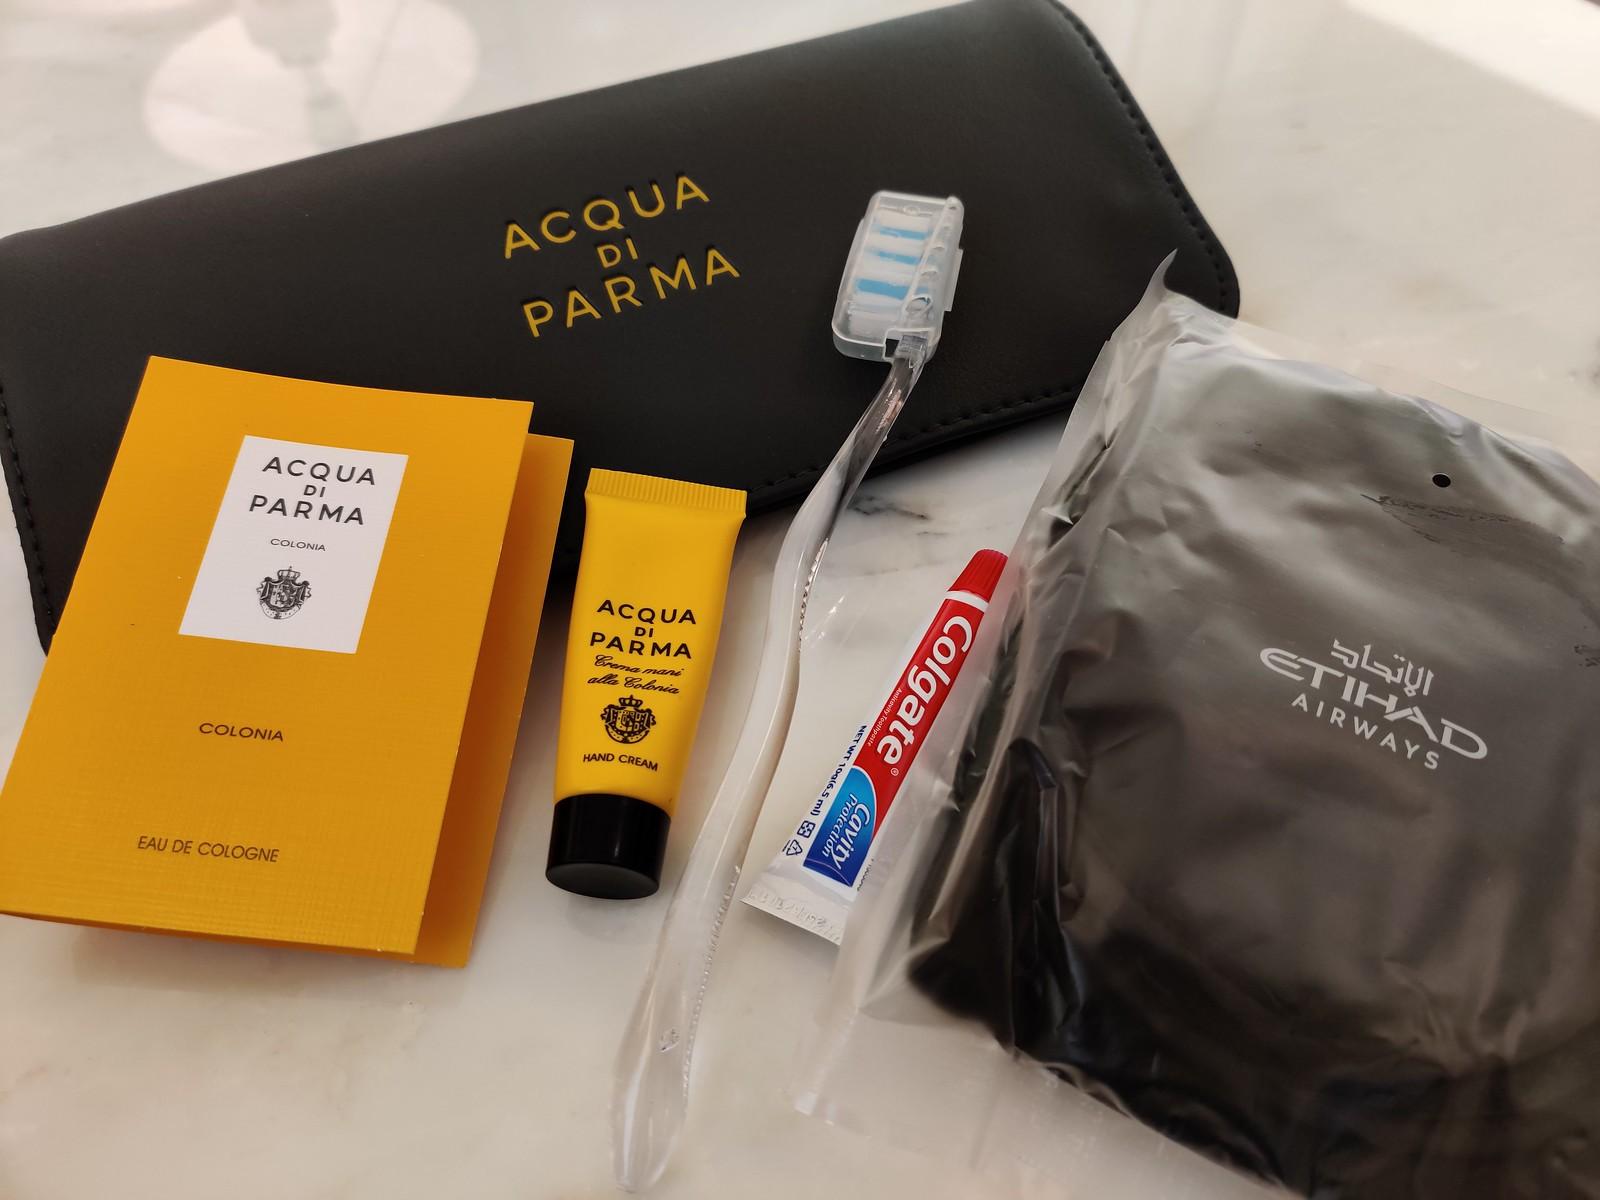 Acqua di Parma amenity kit contents